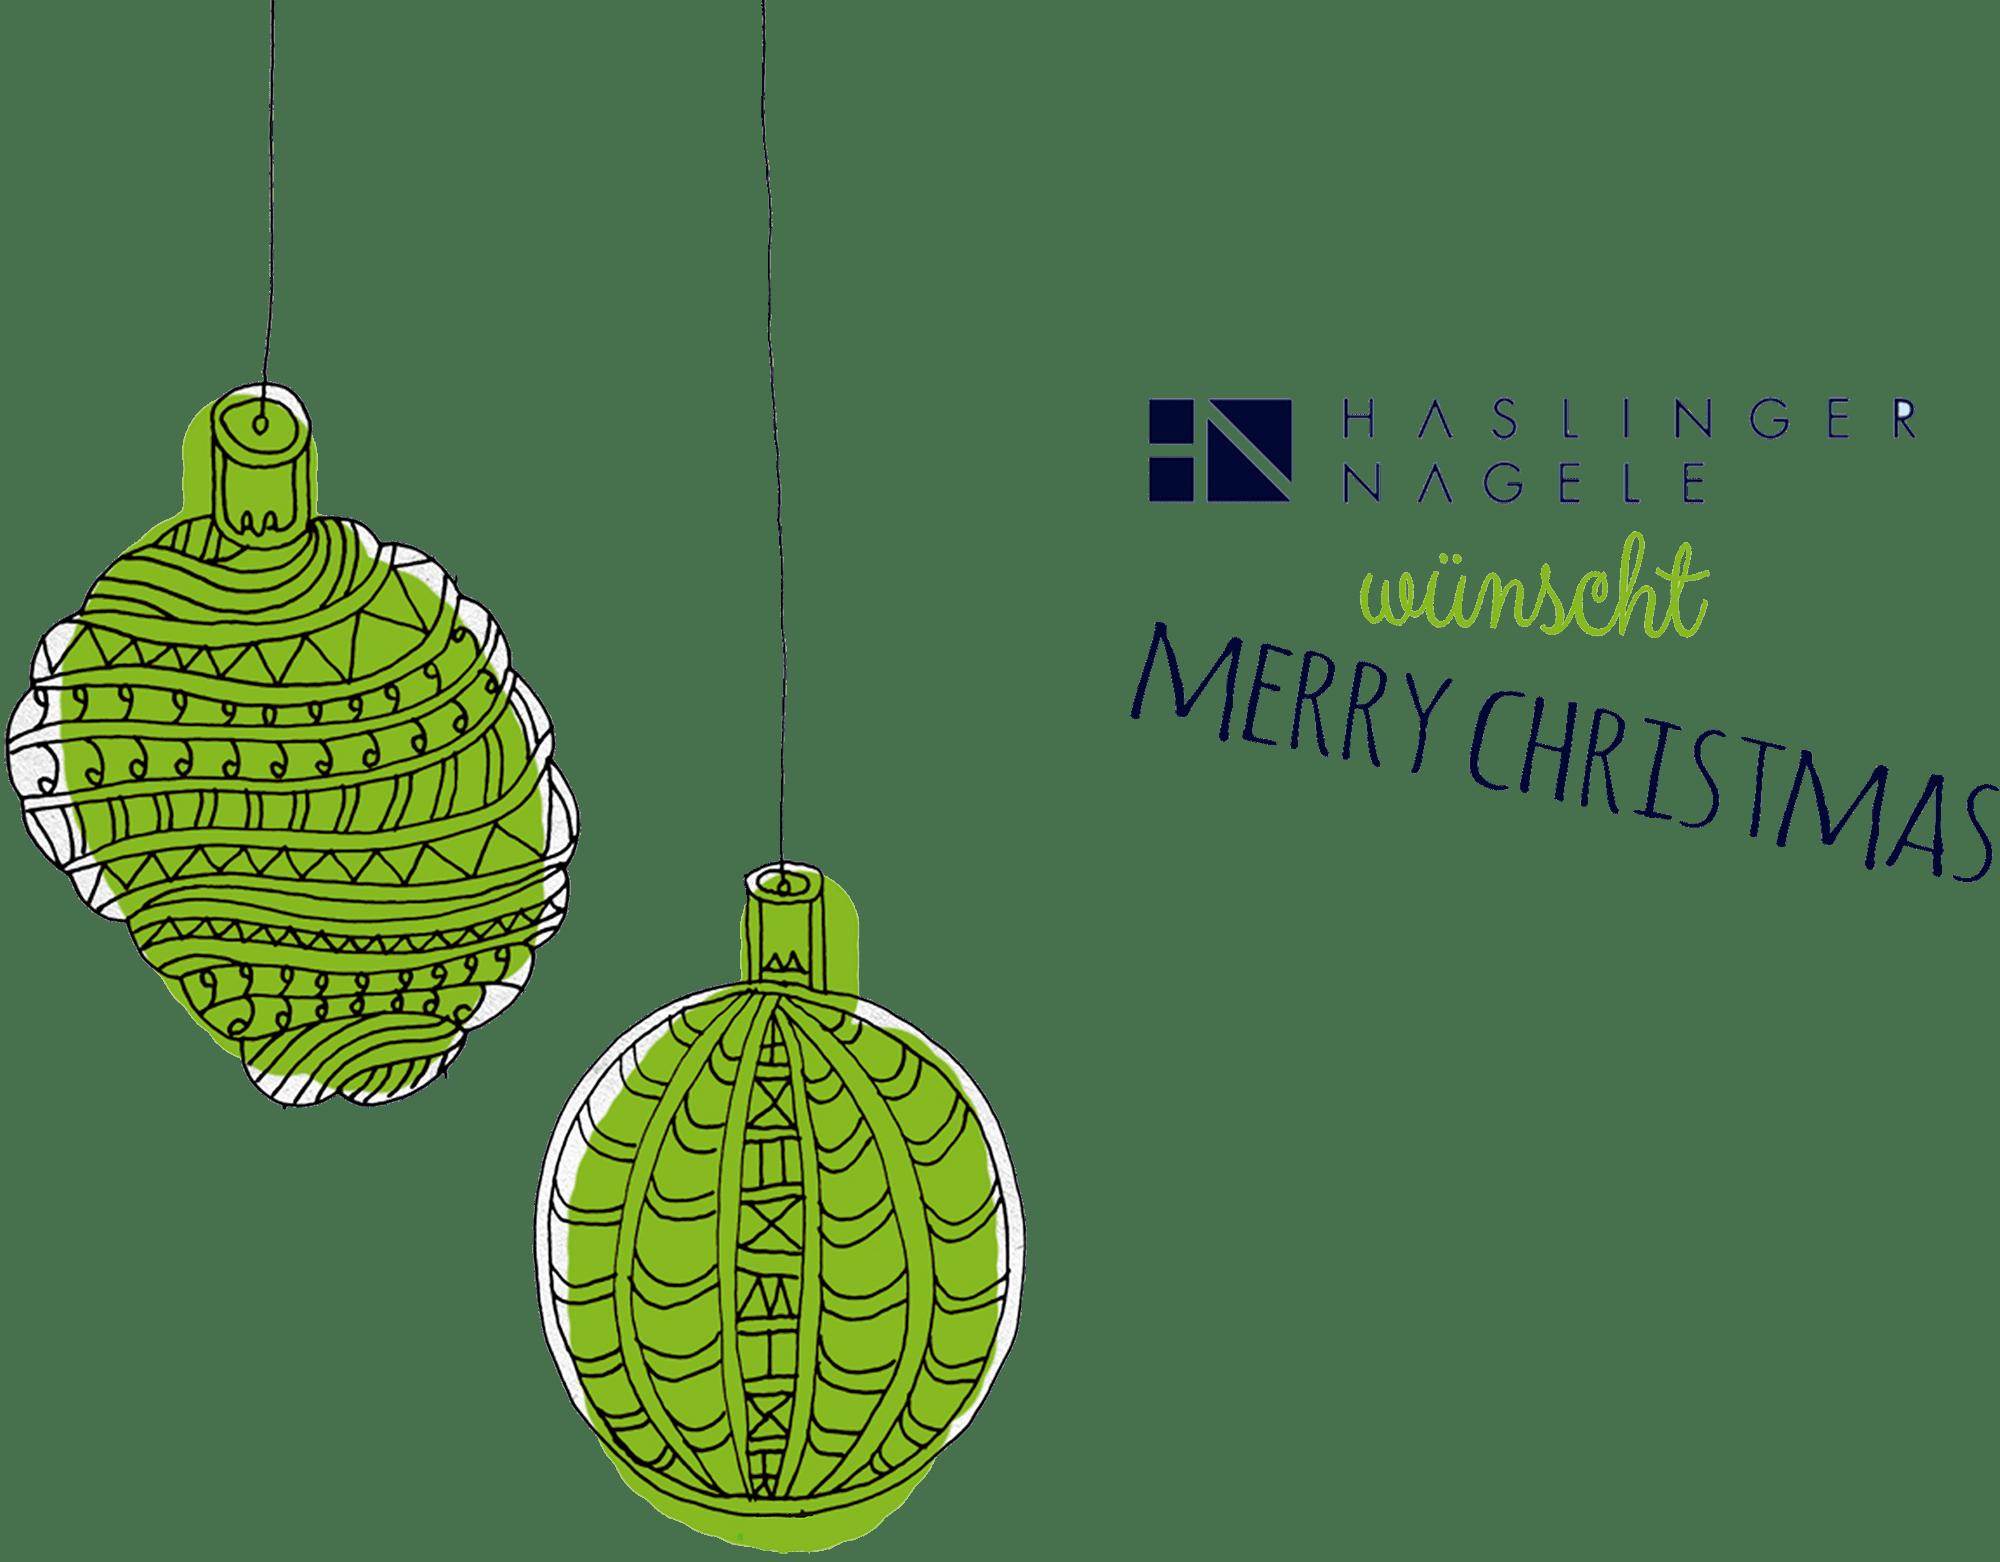 Haslinger / Nagele Merry Christmas. Illustration: Konrad Wartbichler